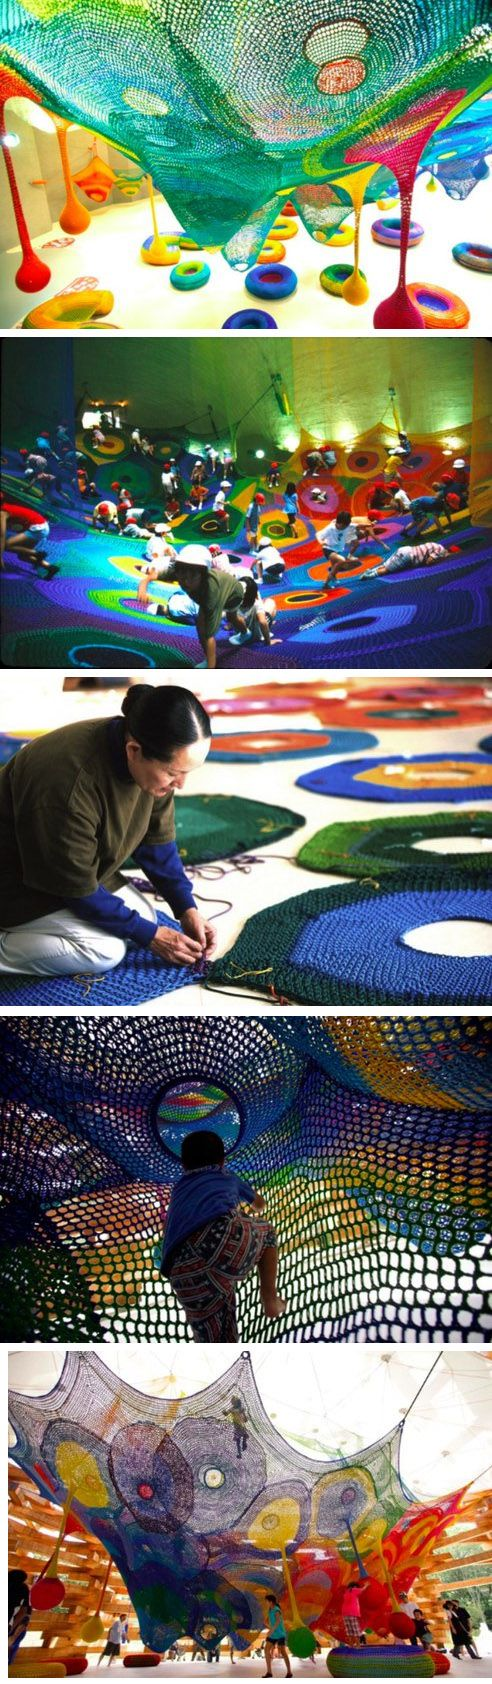 Japanese-born fiber artist Toshiko Horiuchi MacAdam's crocheted fabulous playgrounds for children ( http://netplayworks.com/NetPlayWorks/Projects/Projects.html )